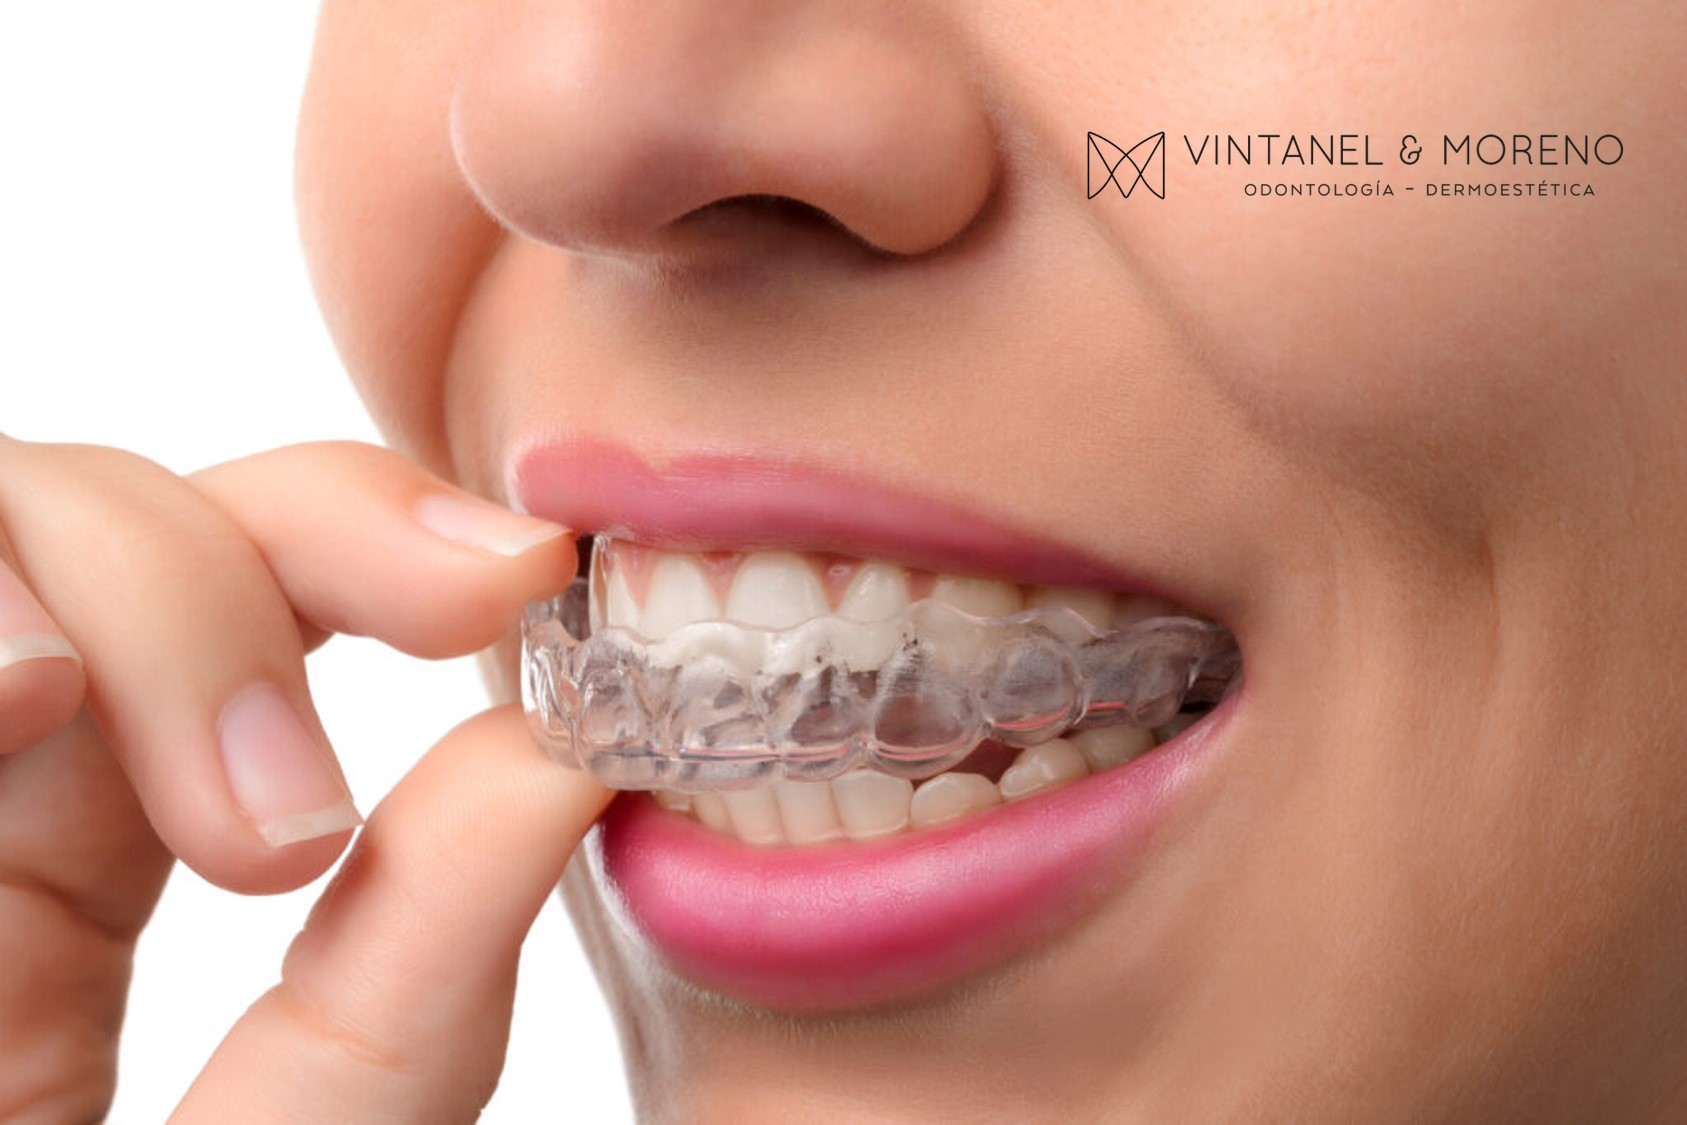 Sistema Invisalign: Ortodoncia estética